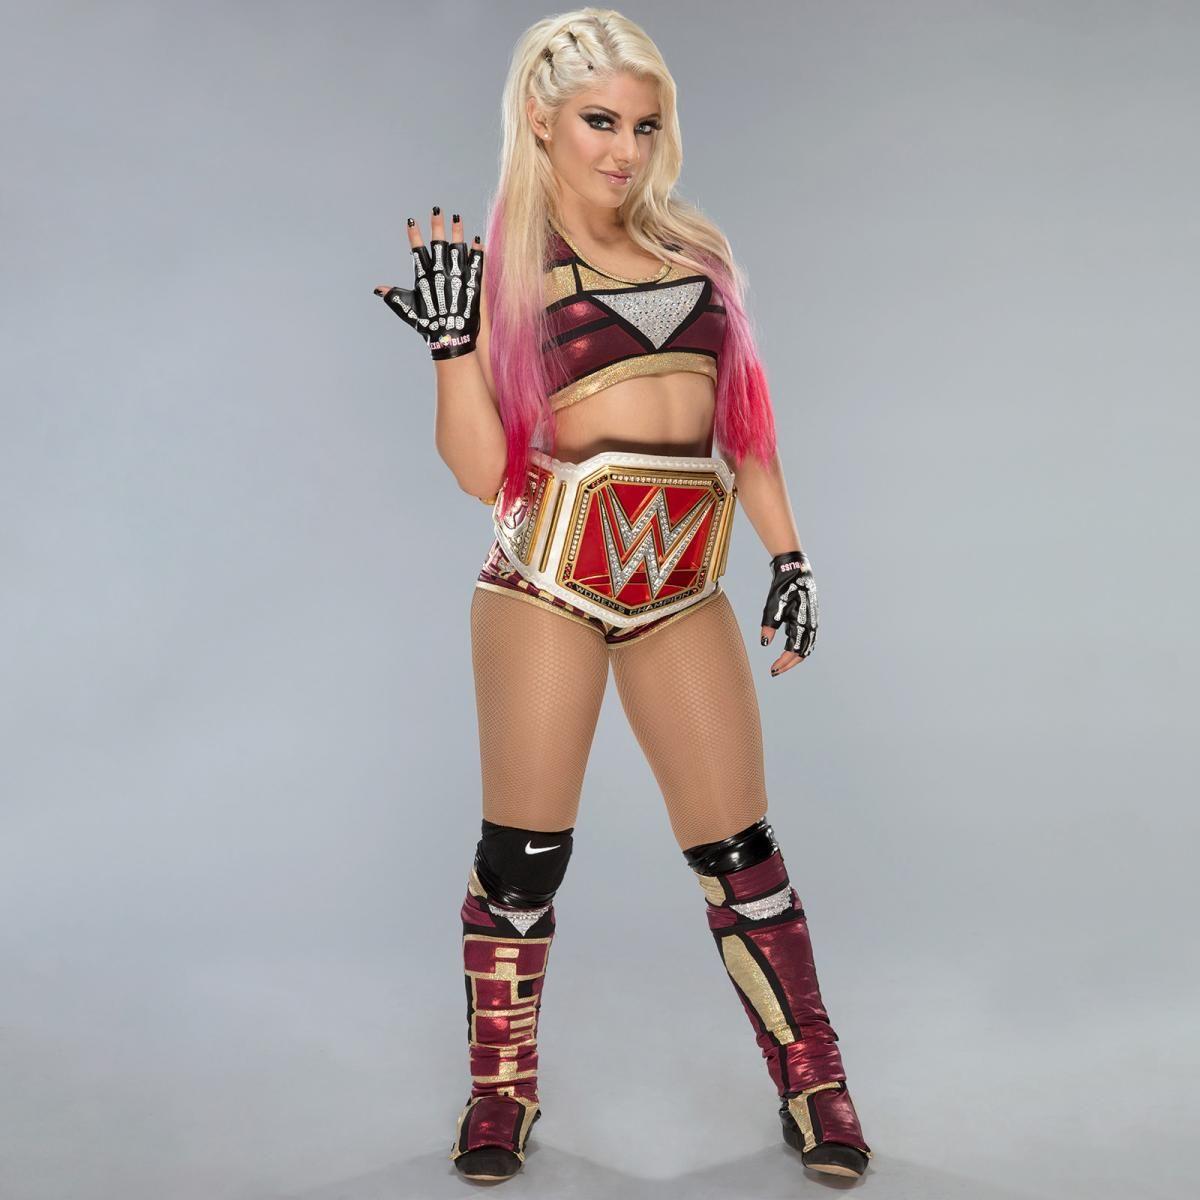 Primera Sesión De Fotos De Alexa Bliss Como Campeona Femenil De Raw